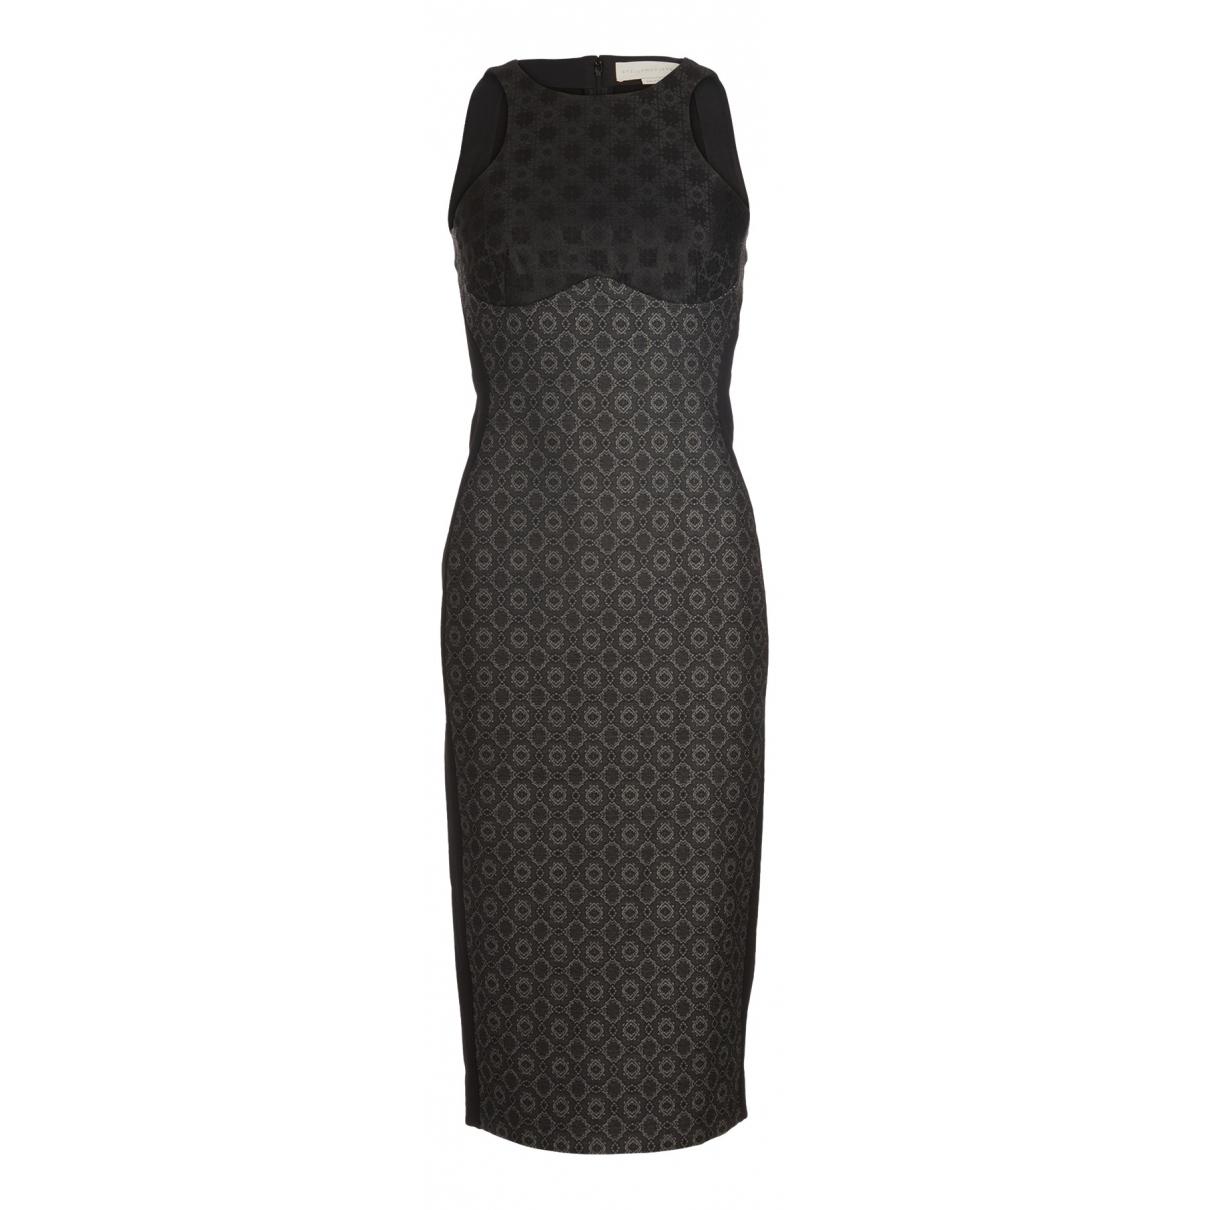 Stella Mccartney N Black Cotton dress for Women 8 UK